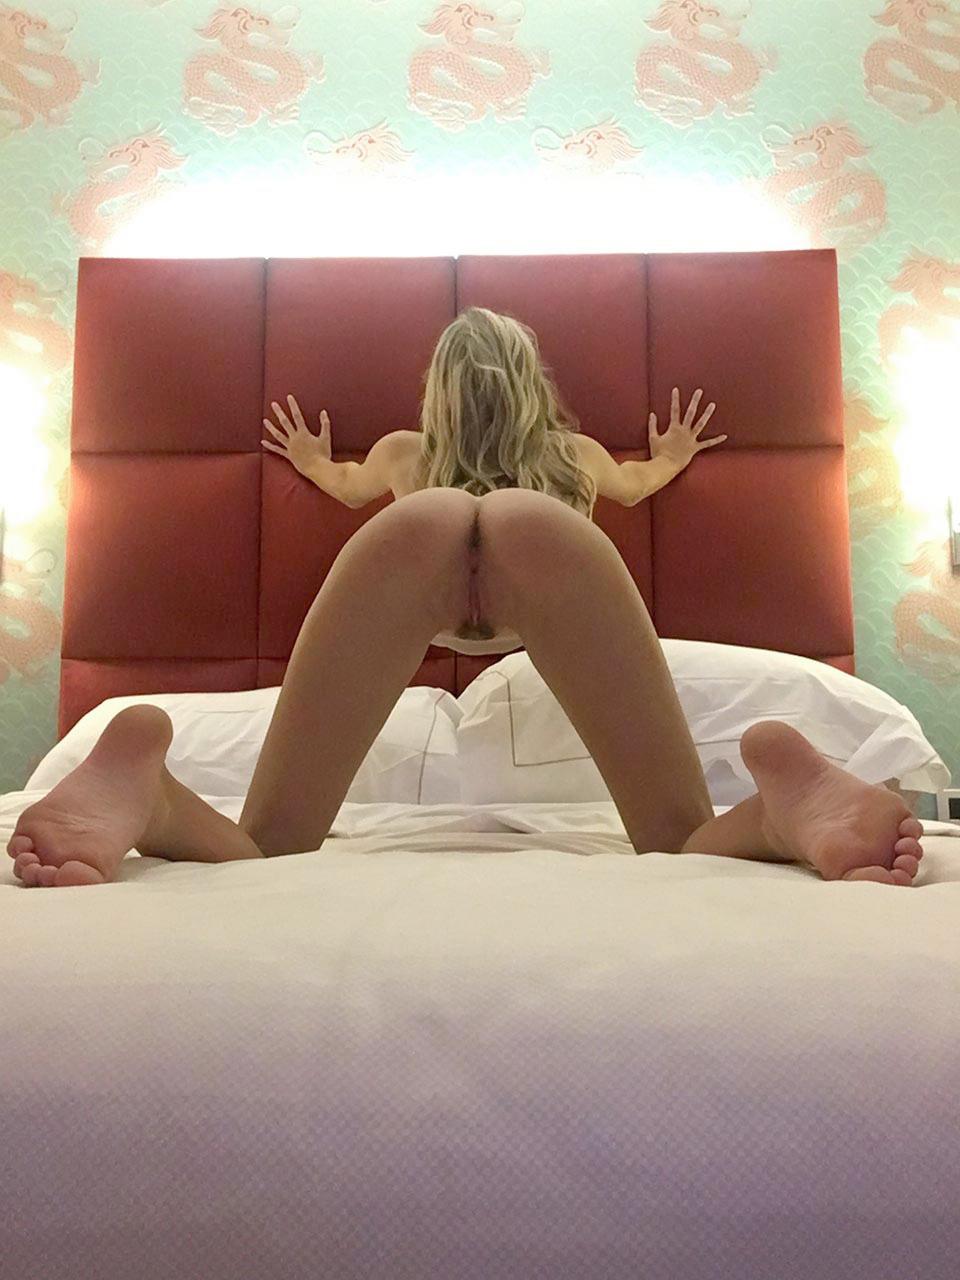 Noel Capri Berry nude masturbation and squirting peeing video leaked